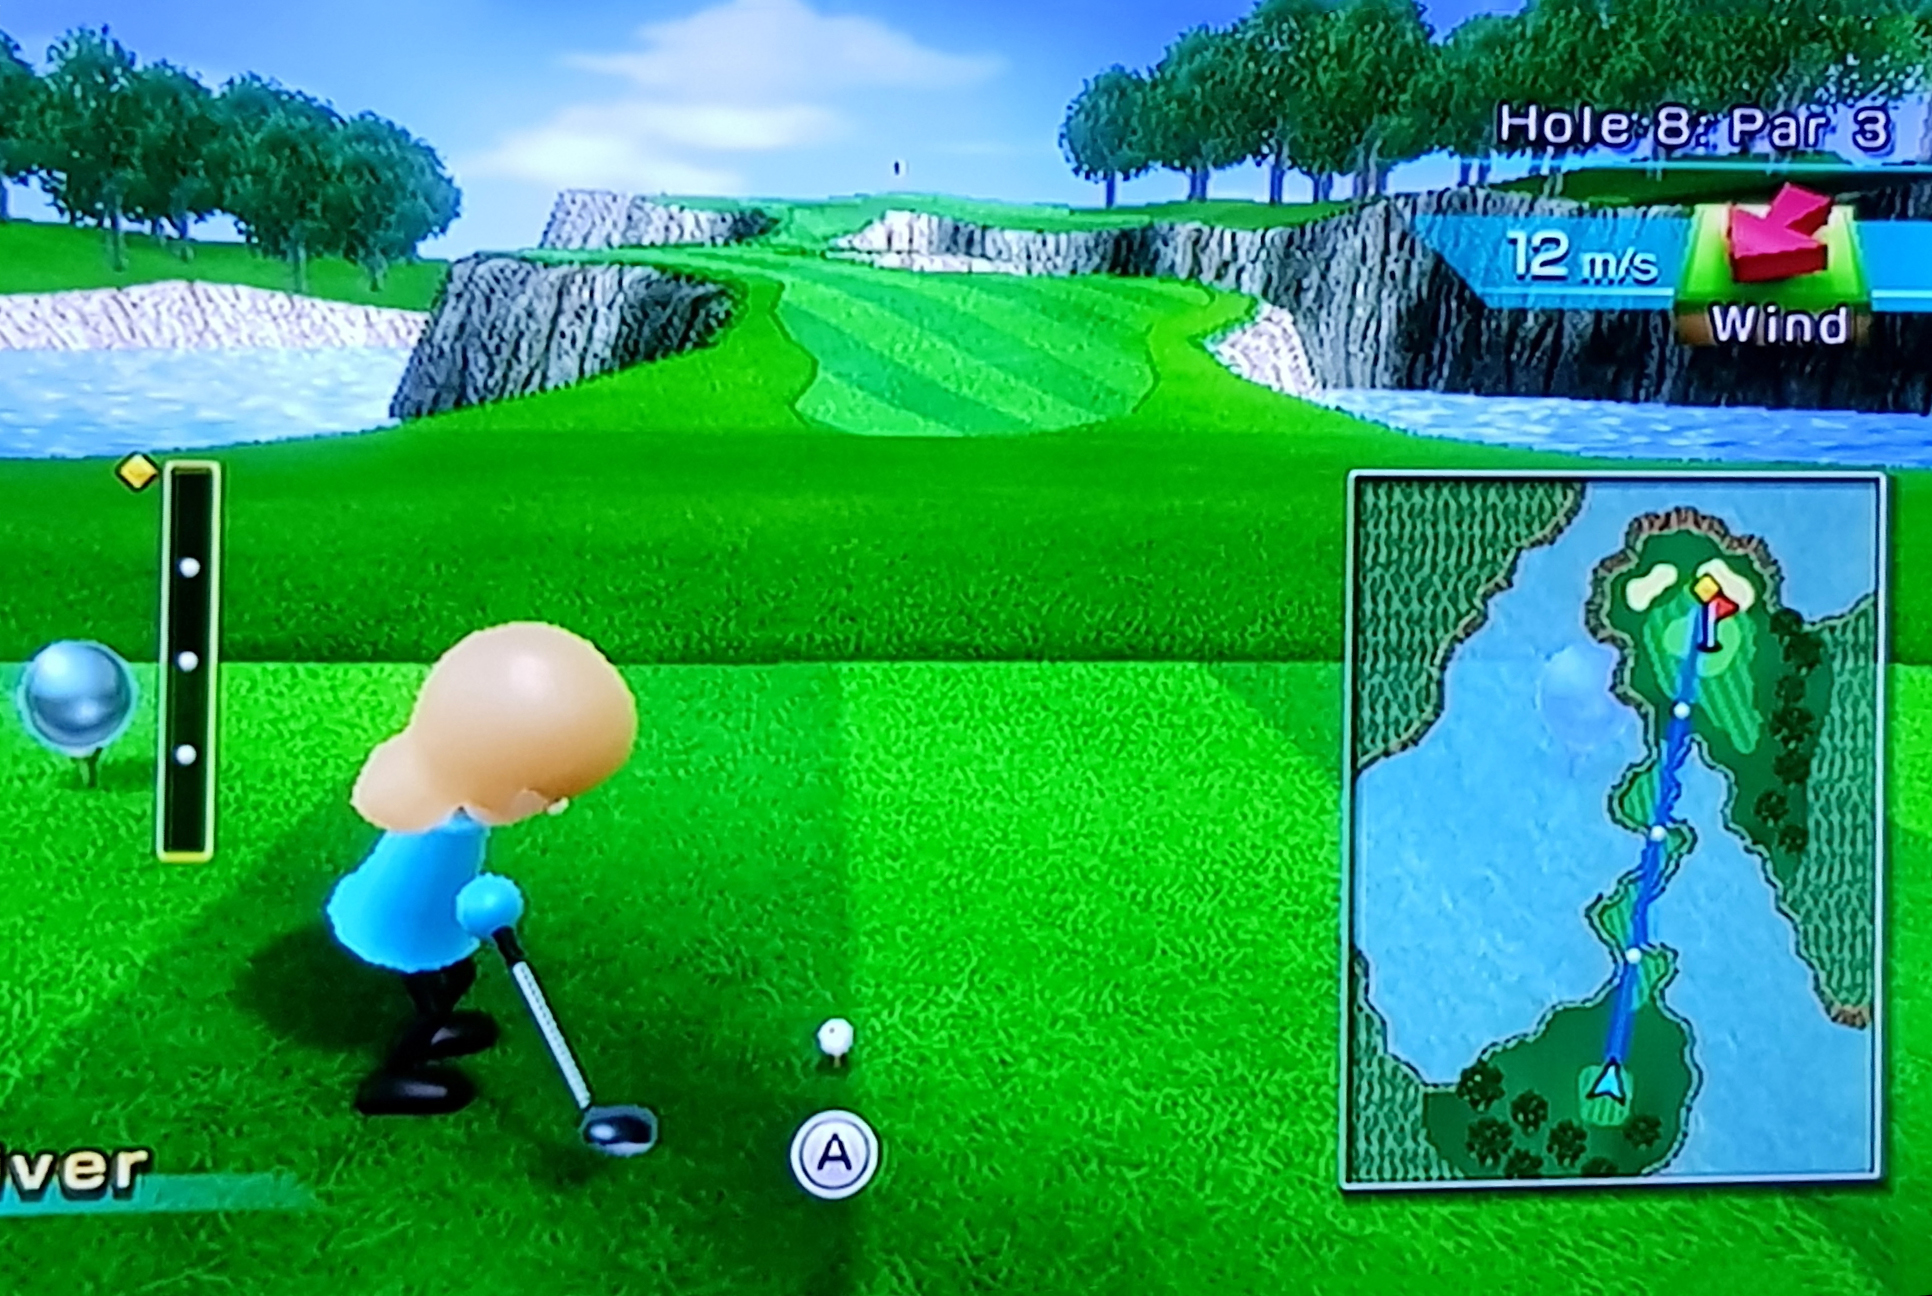 Gay's golf and bowls